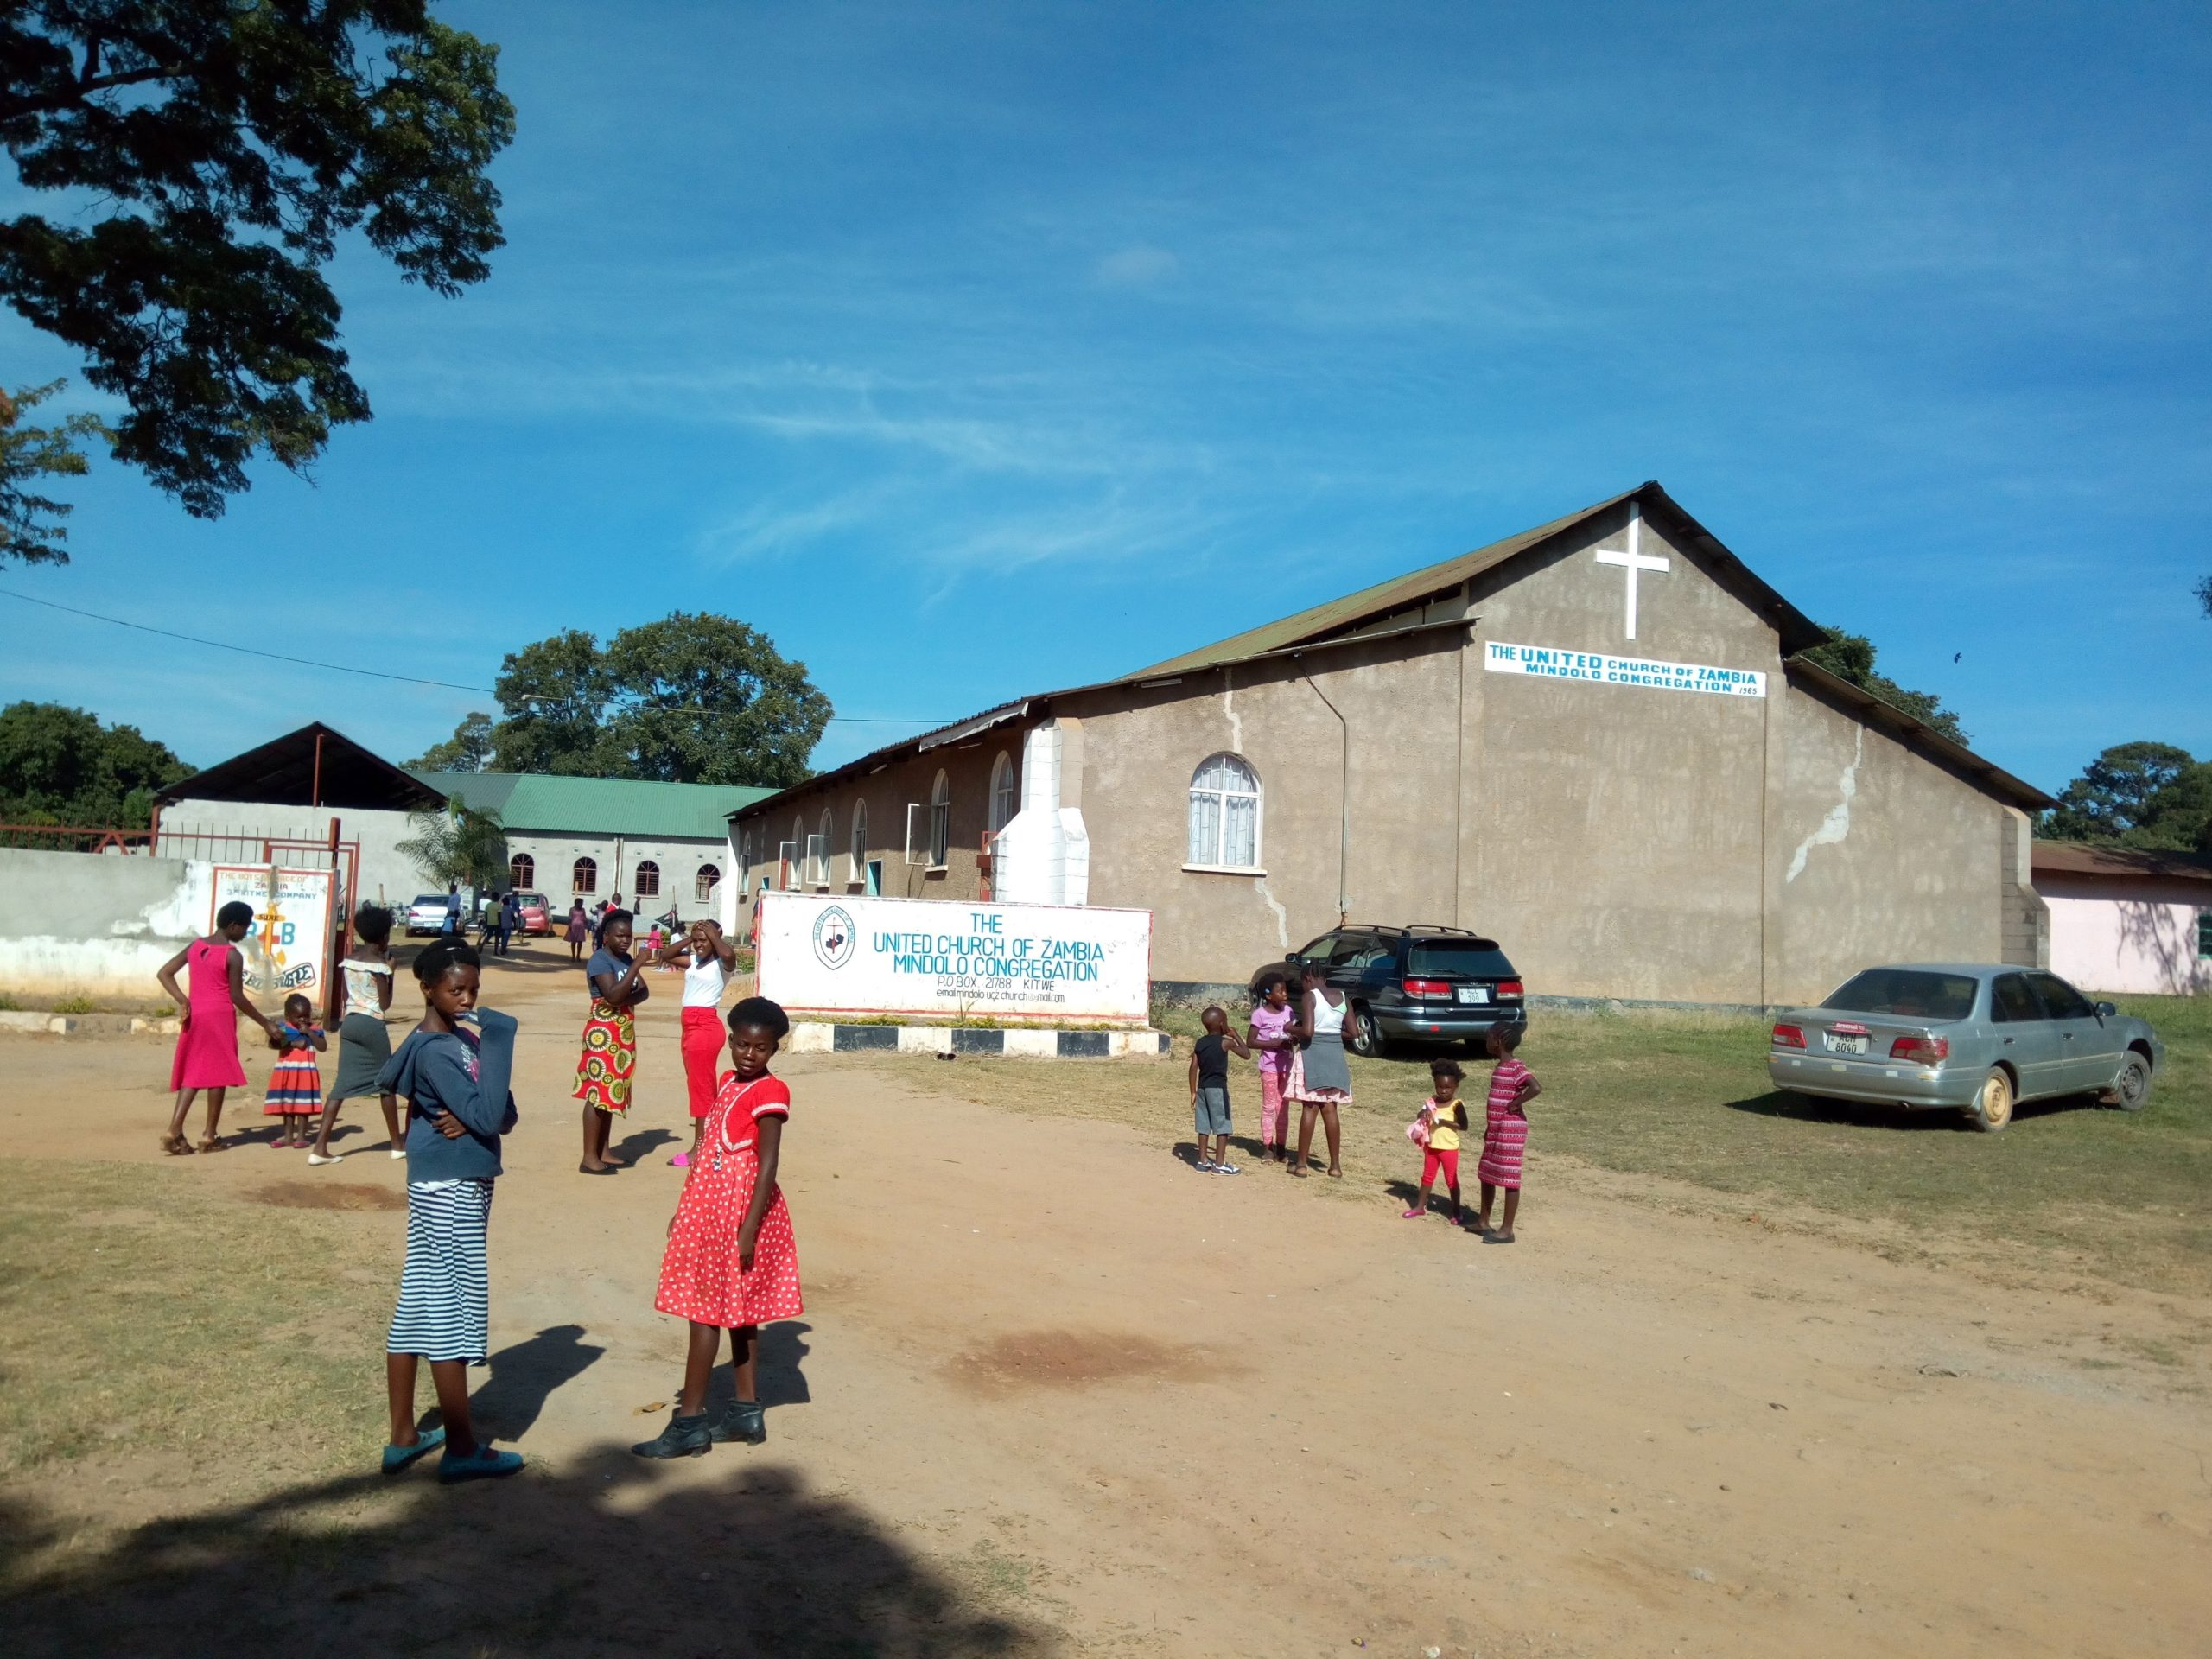 Zambia_Charo_Breckenridge_IMG_20190512_091835.jpeg